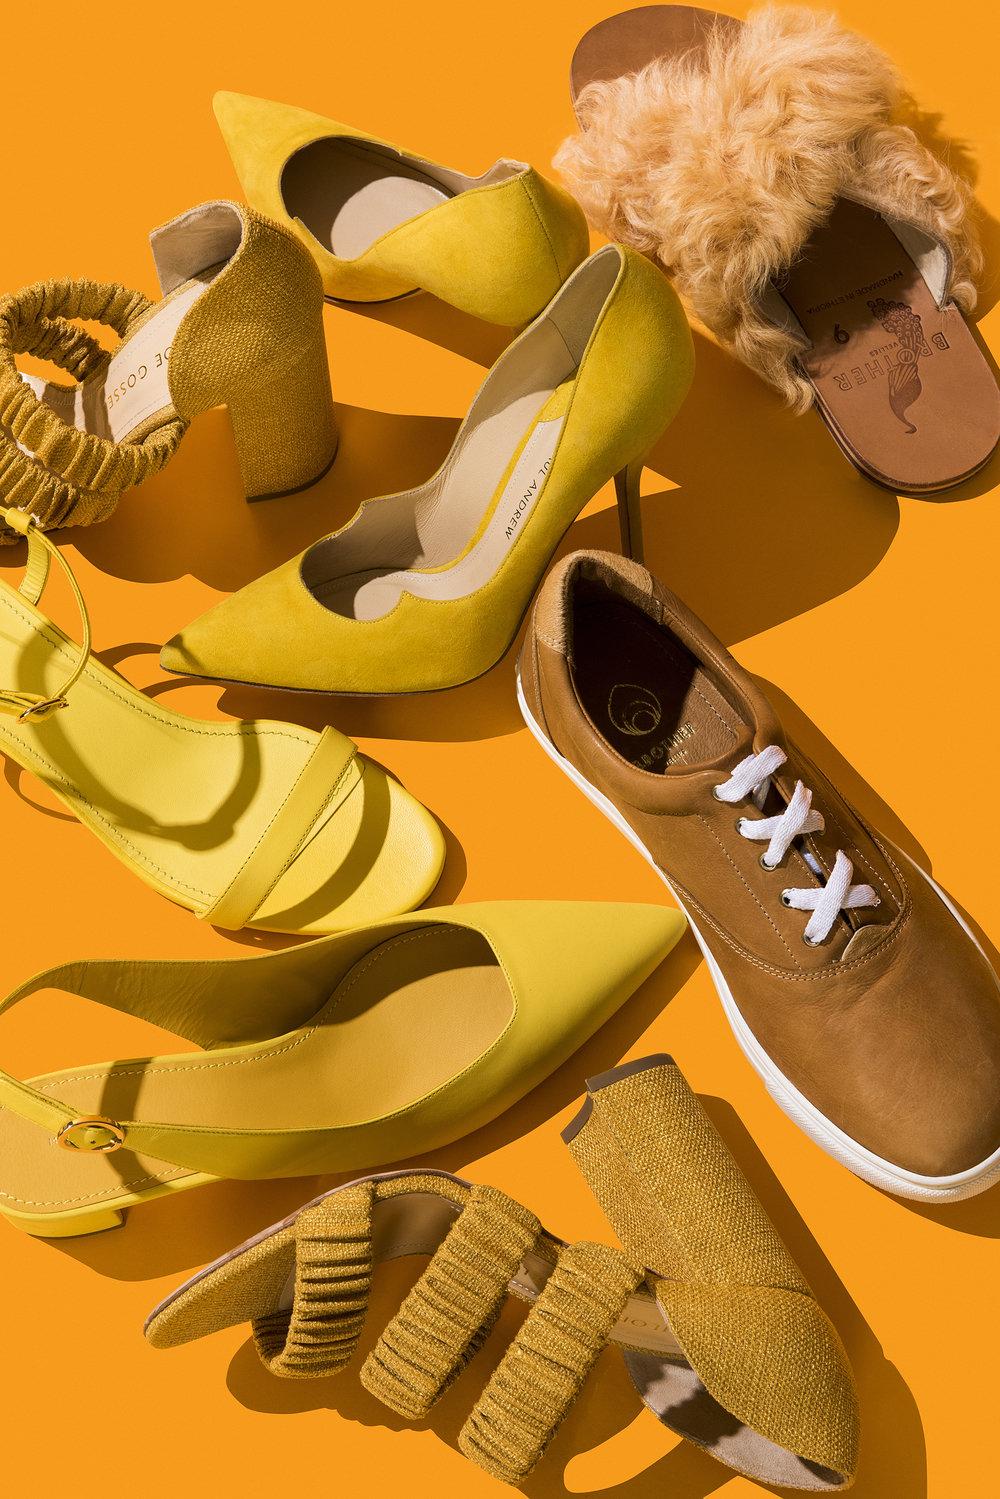 Shoes_Final_web.jpg